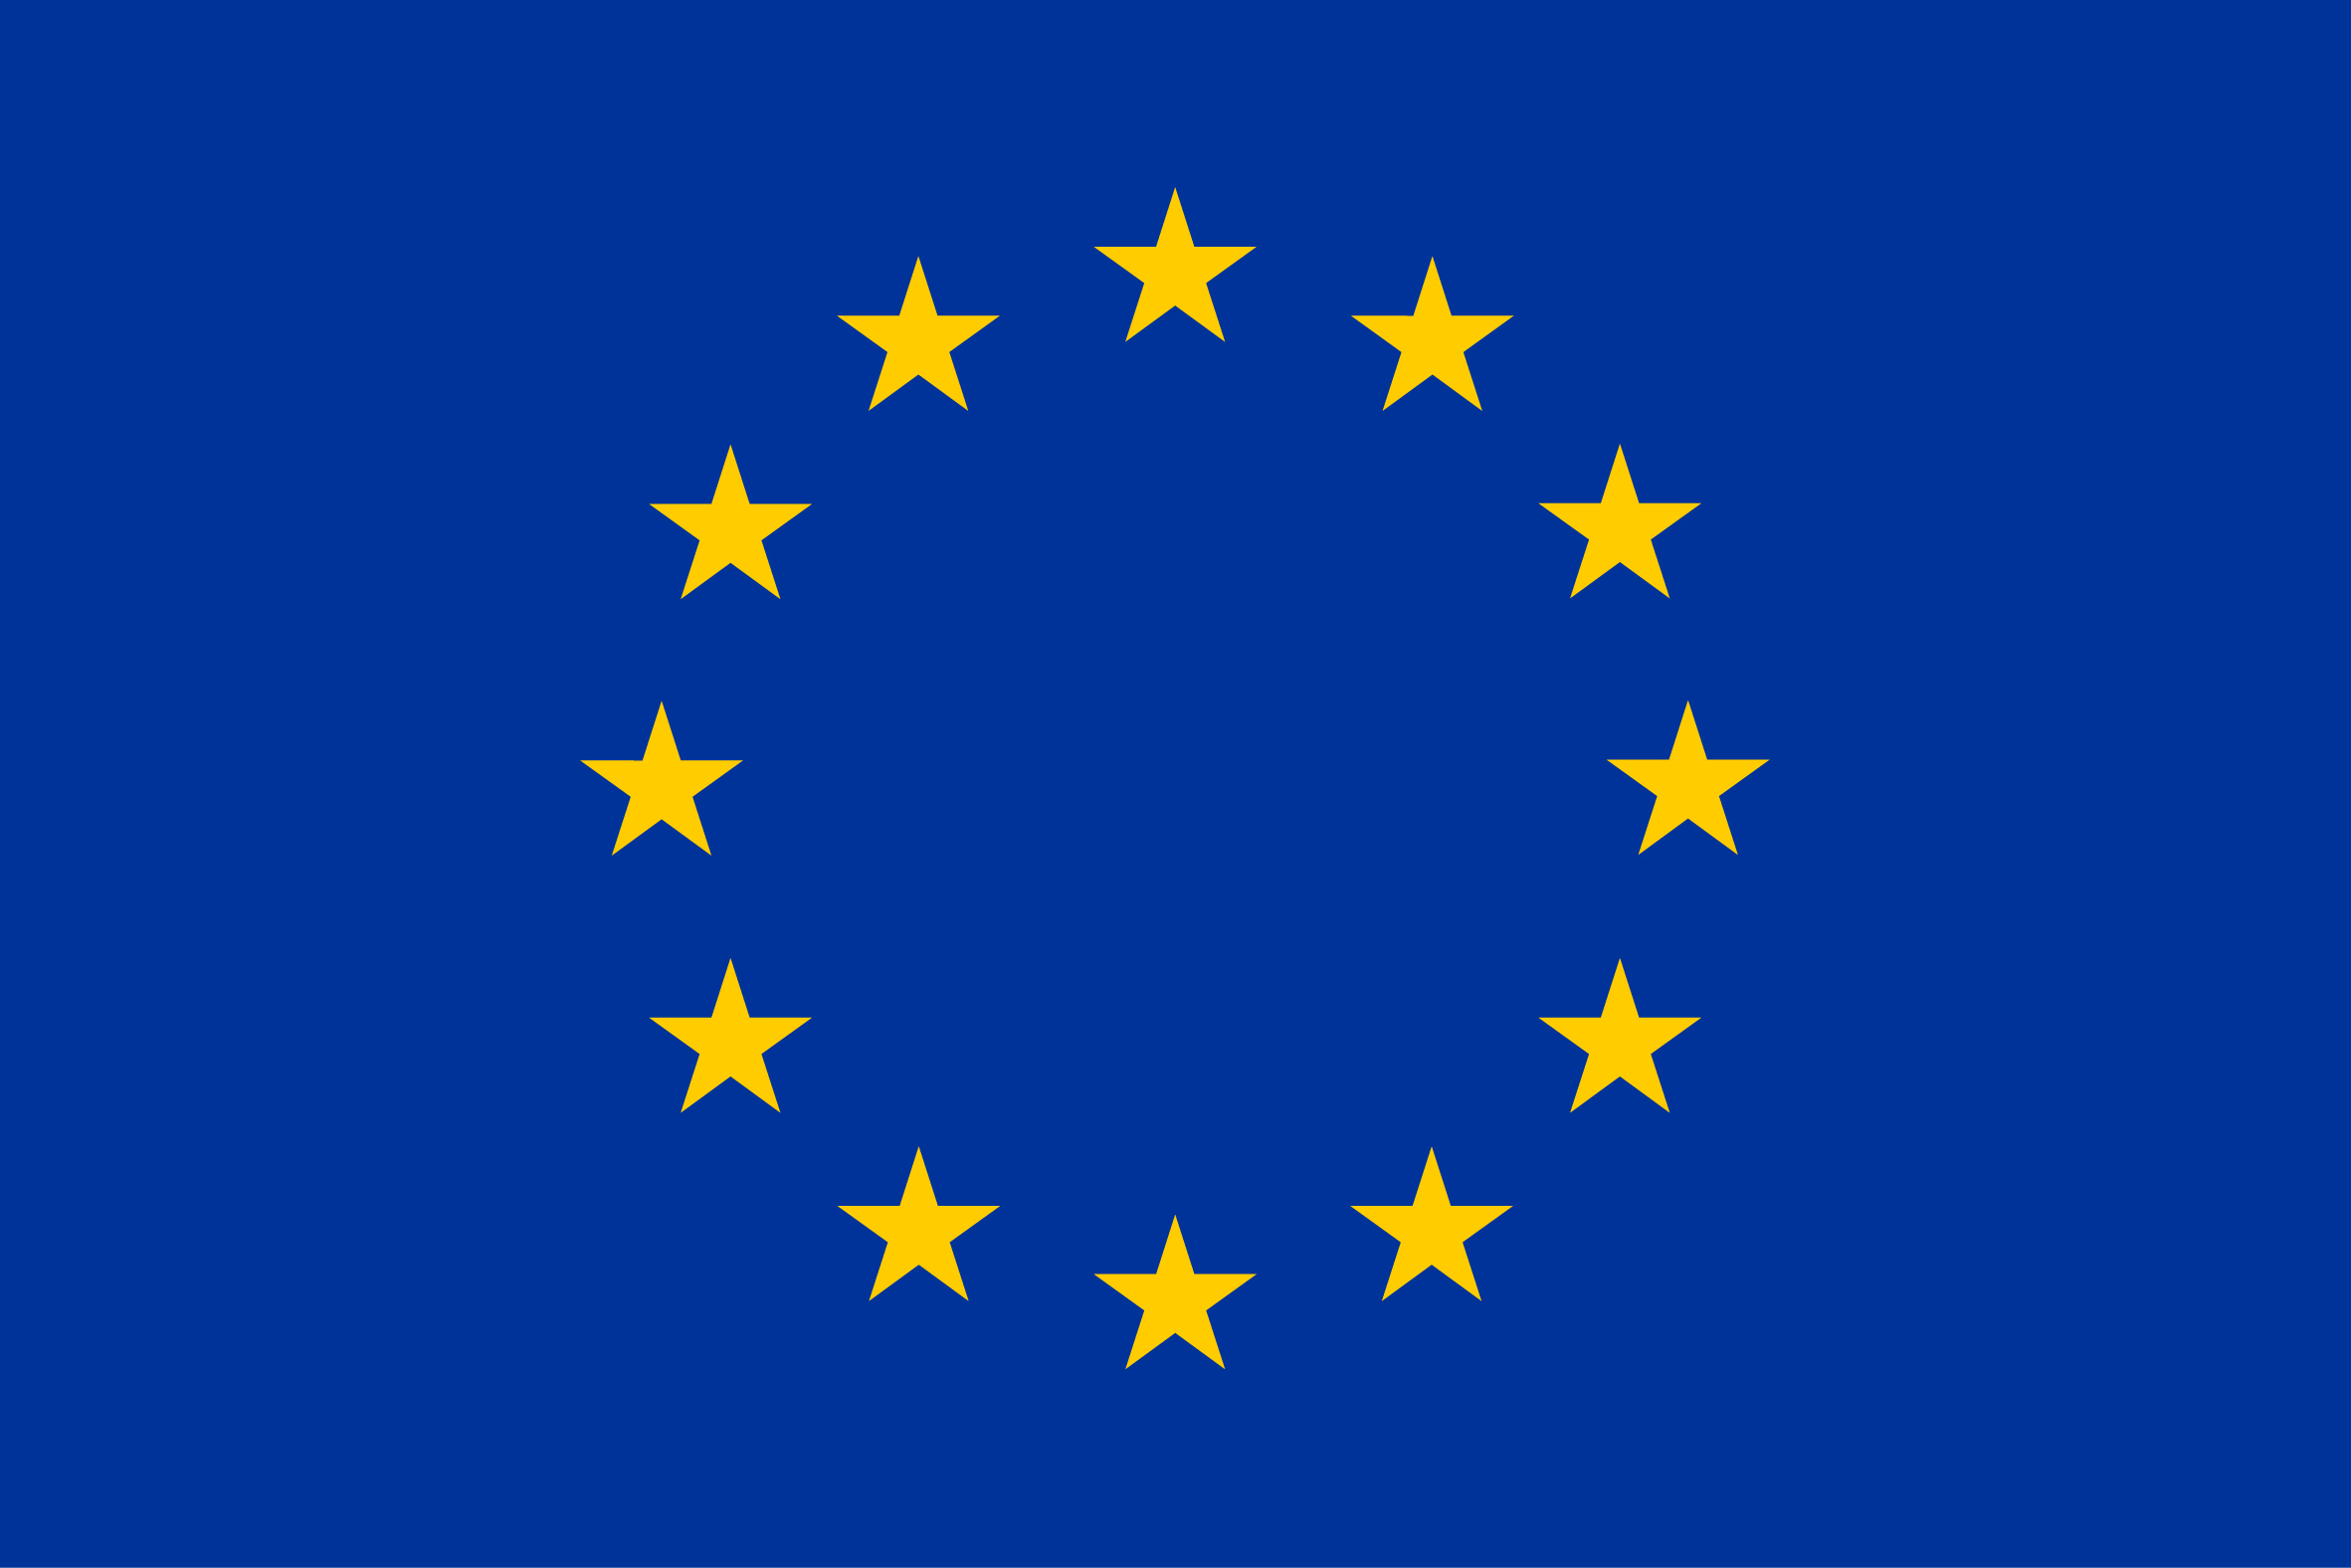 Europa flag_yellow_high